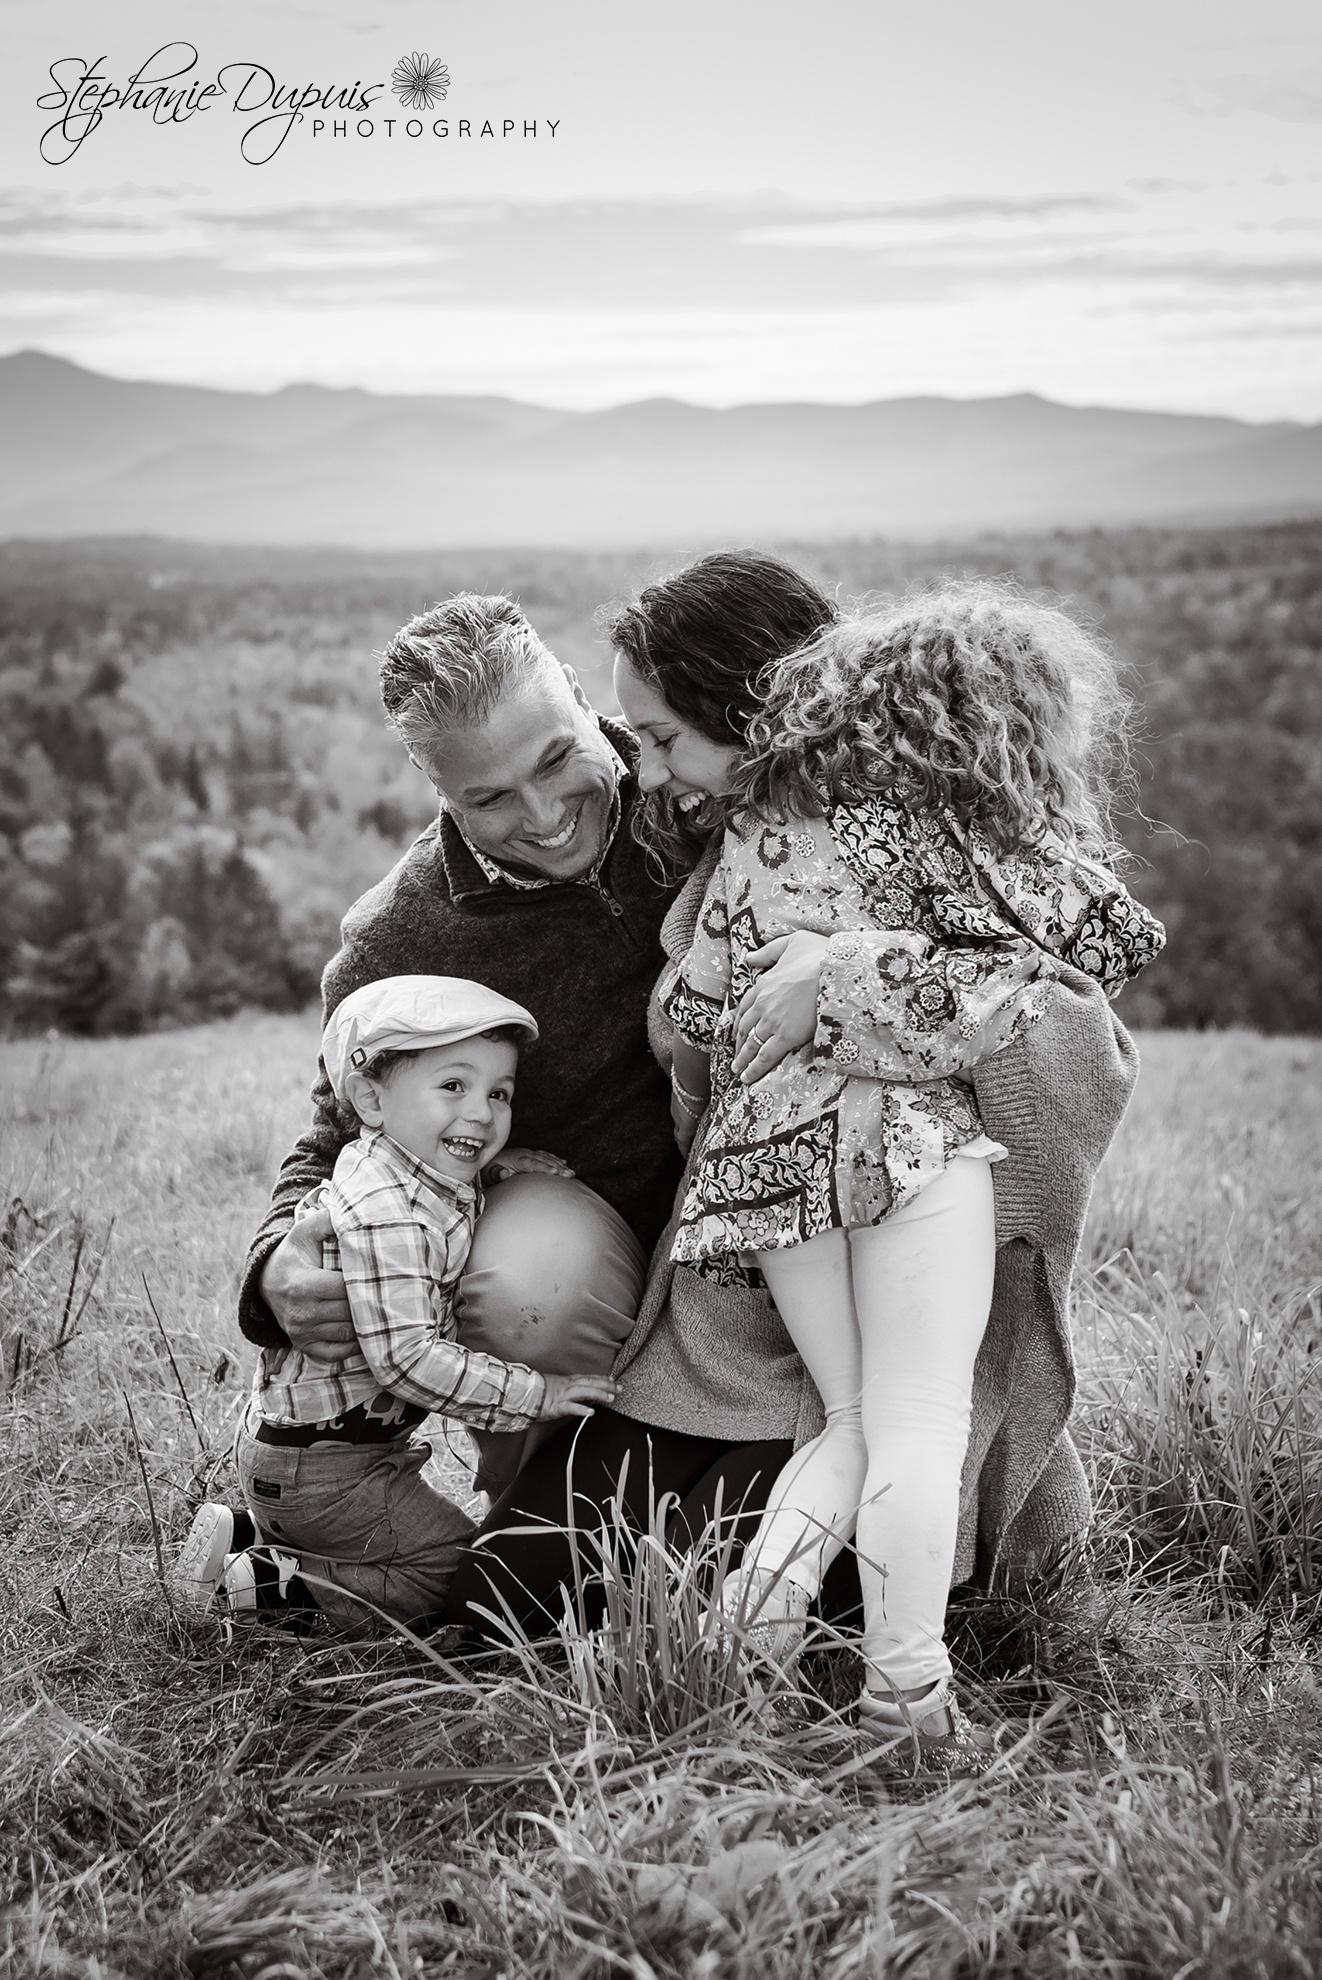 Frisina 9 - Portfolio: Frisina Family